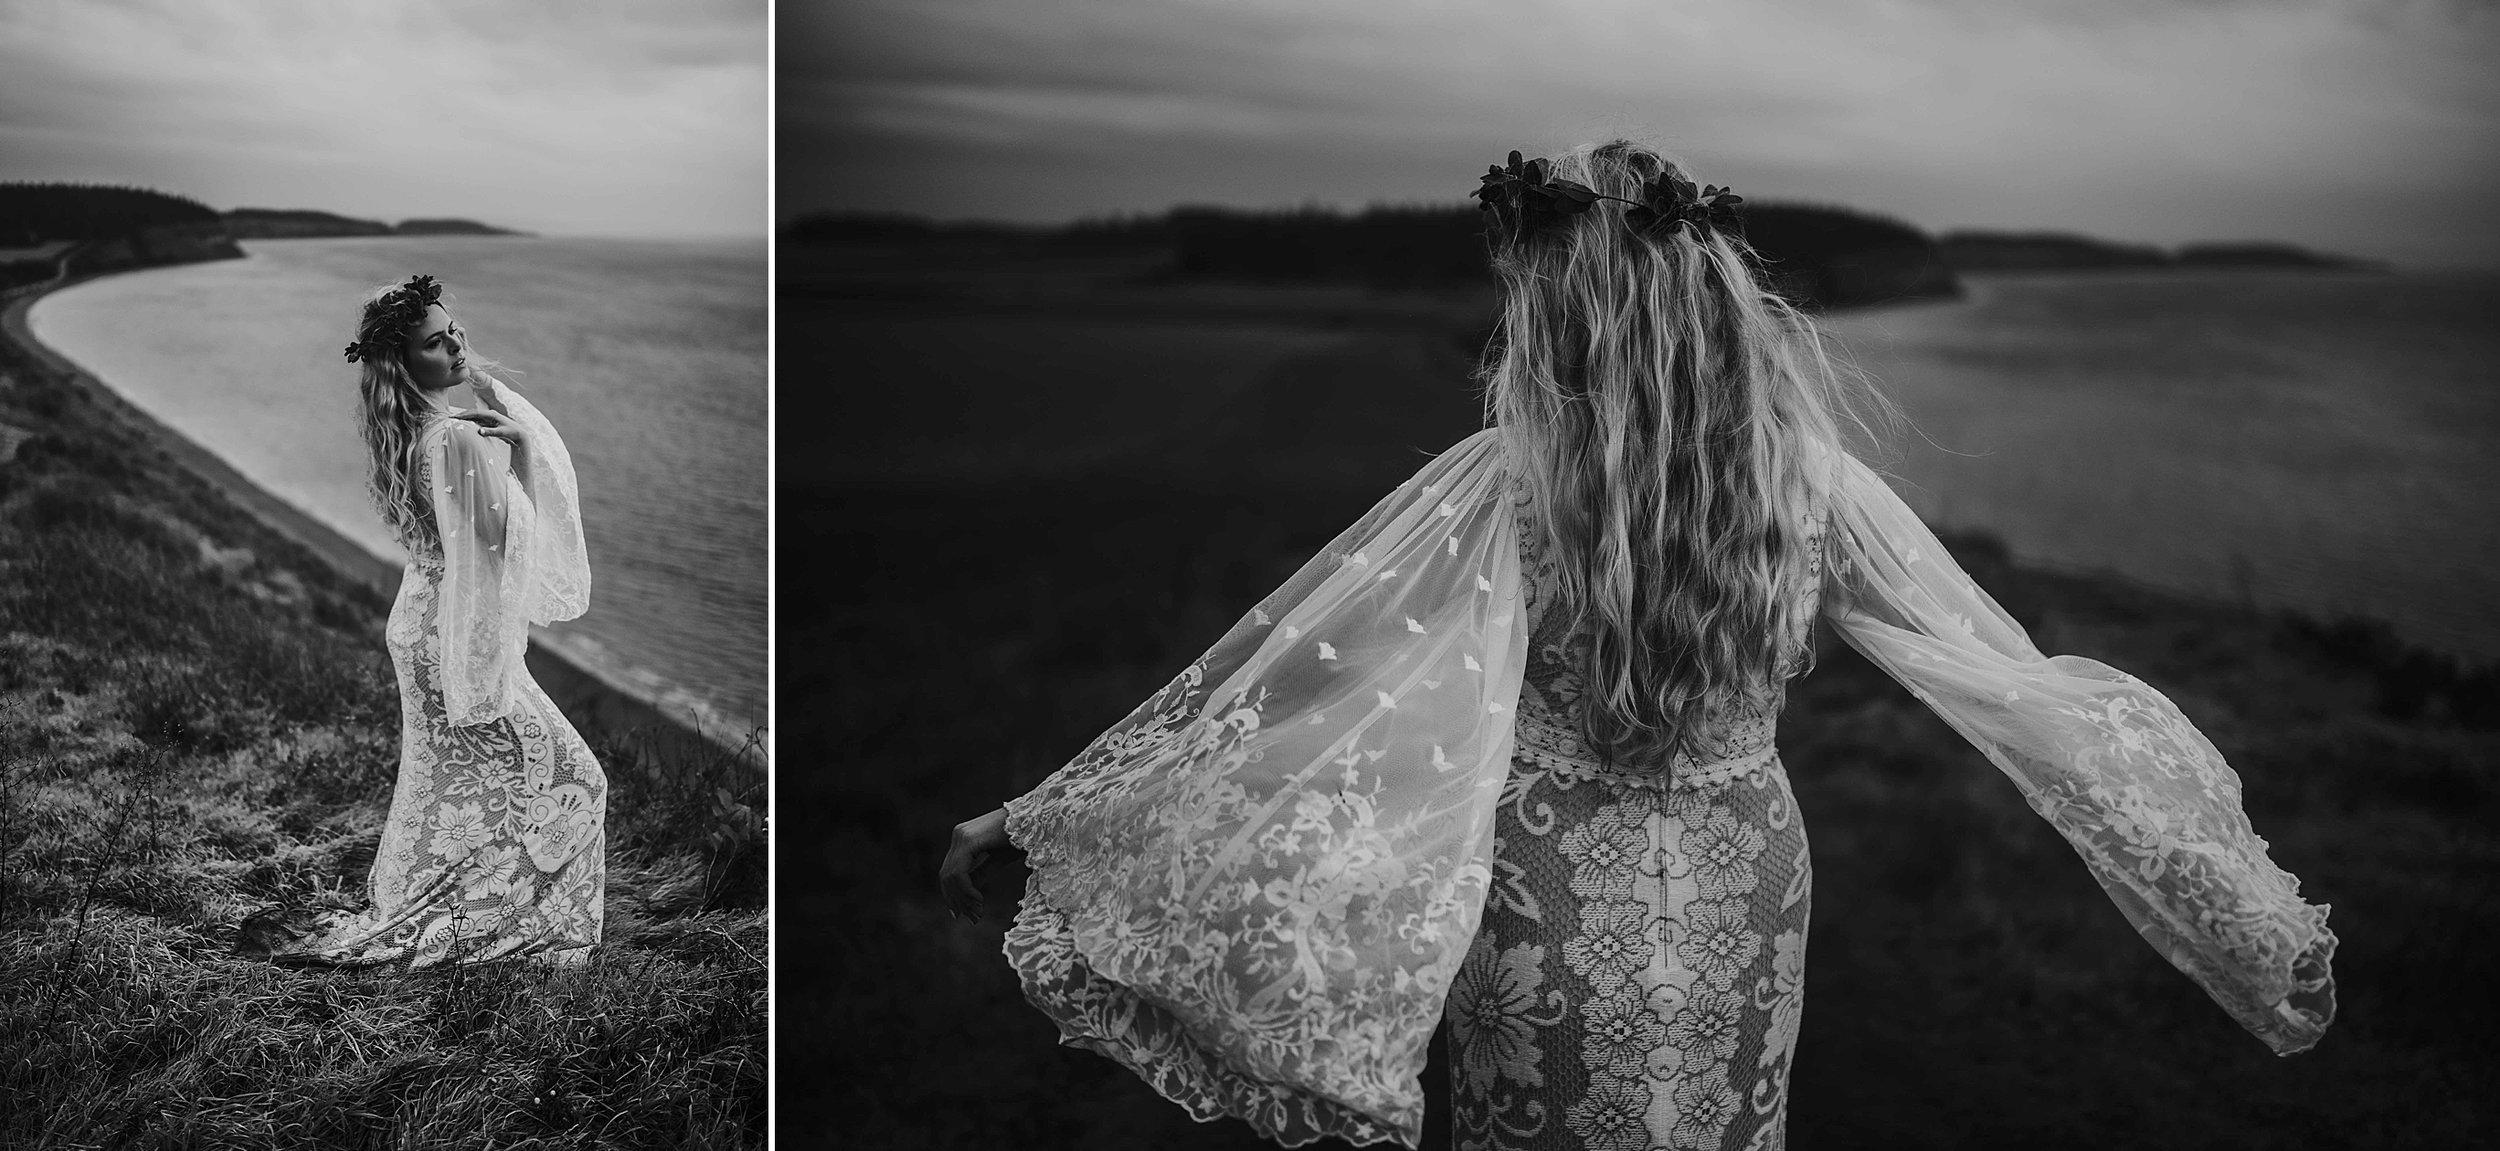 Wedding-photographer-J HODGES PHOTOGRAPHY_0224.jpg